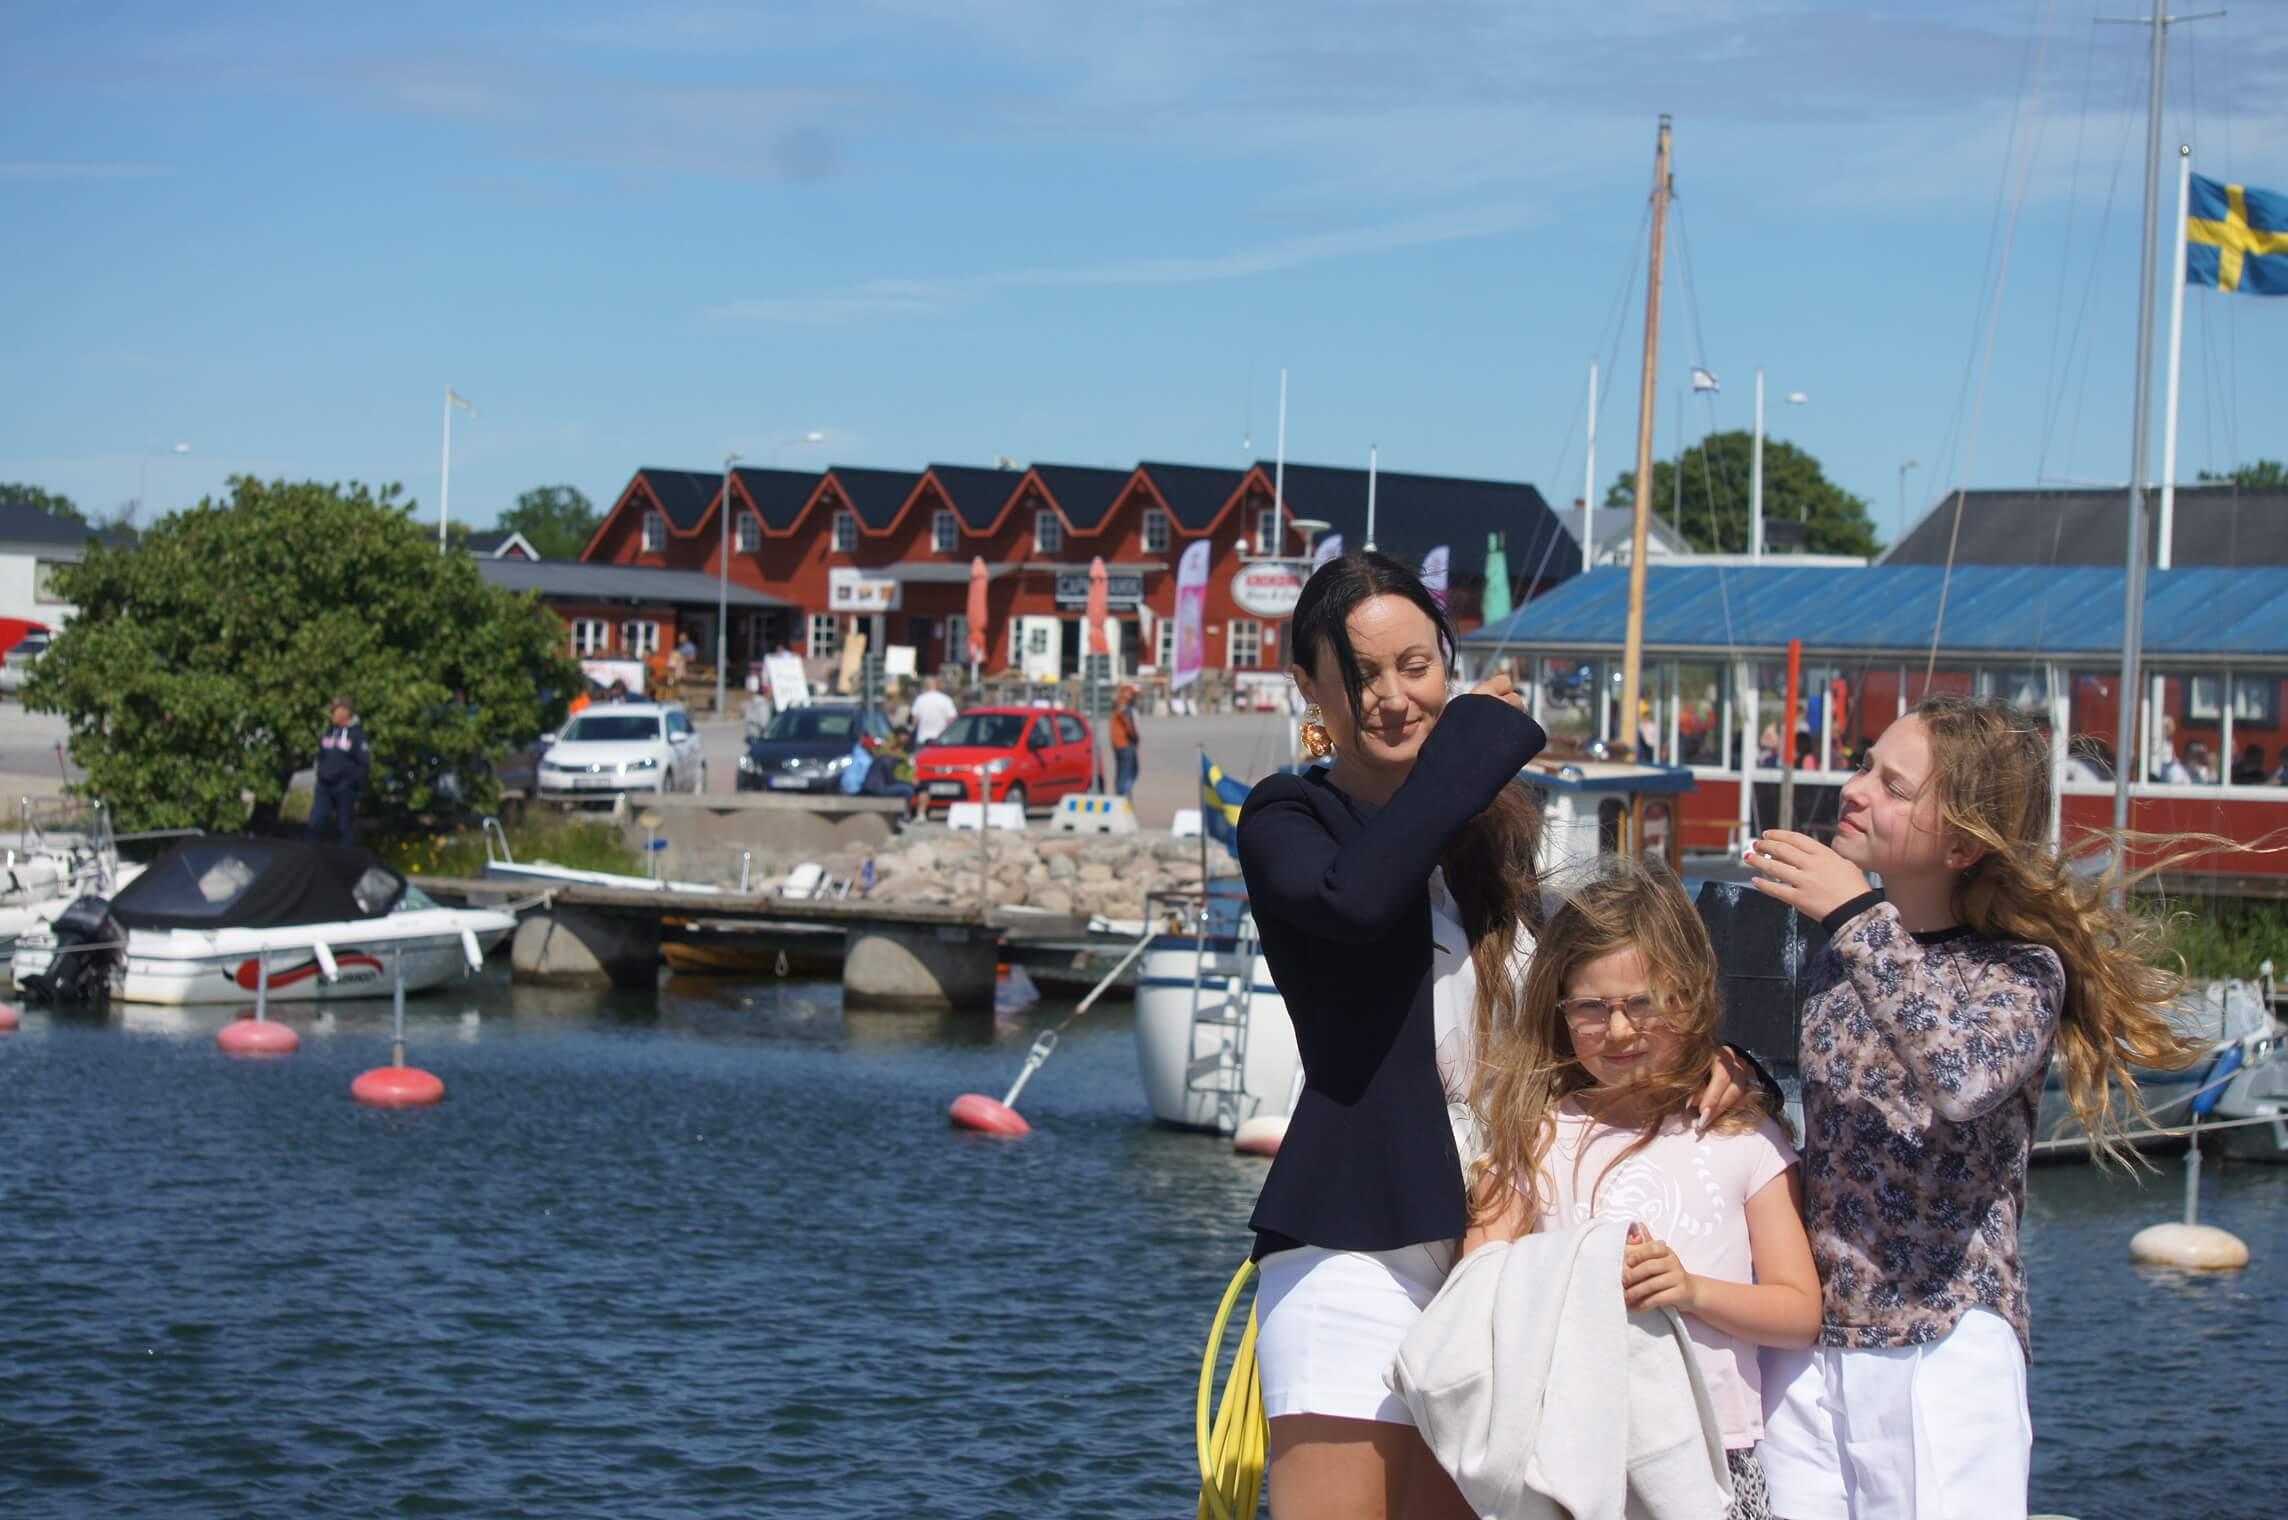 byxelkrog, hamnen, öland, cafe, scanlan theodore, river island